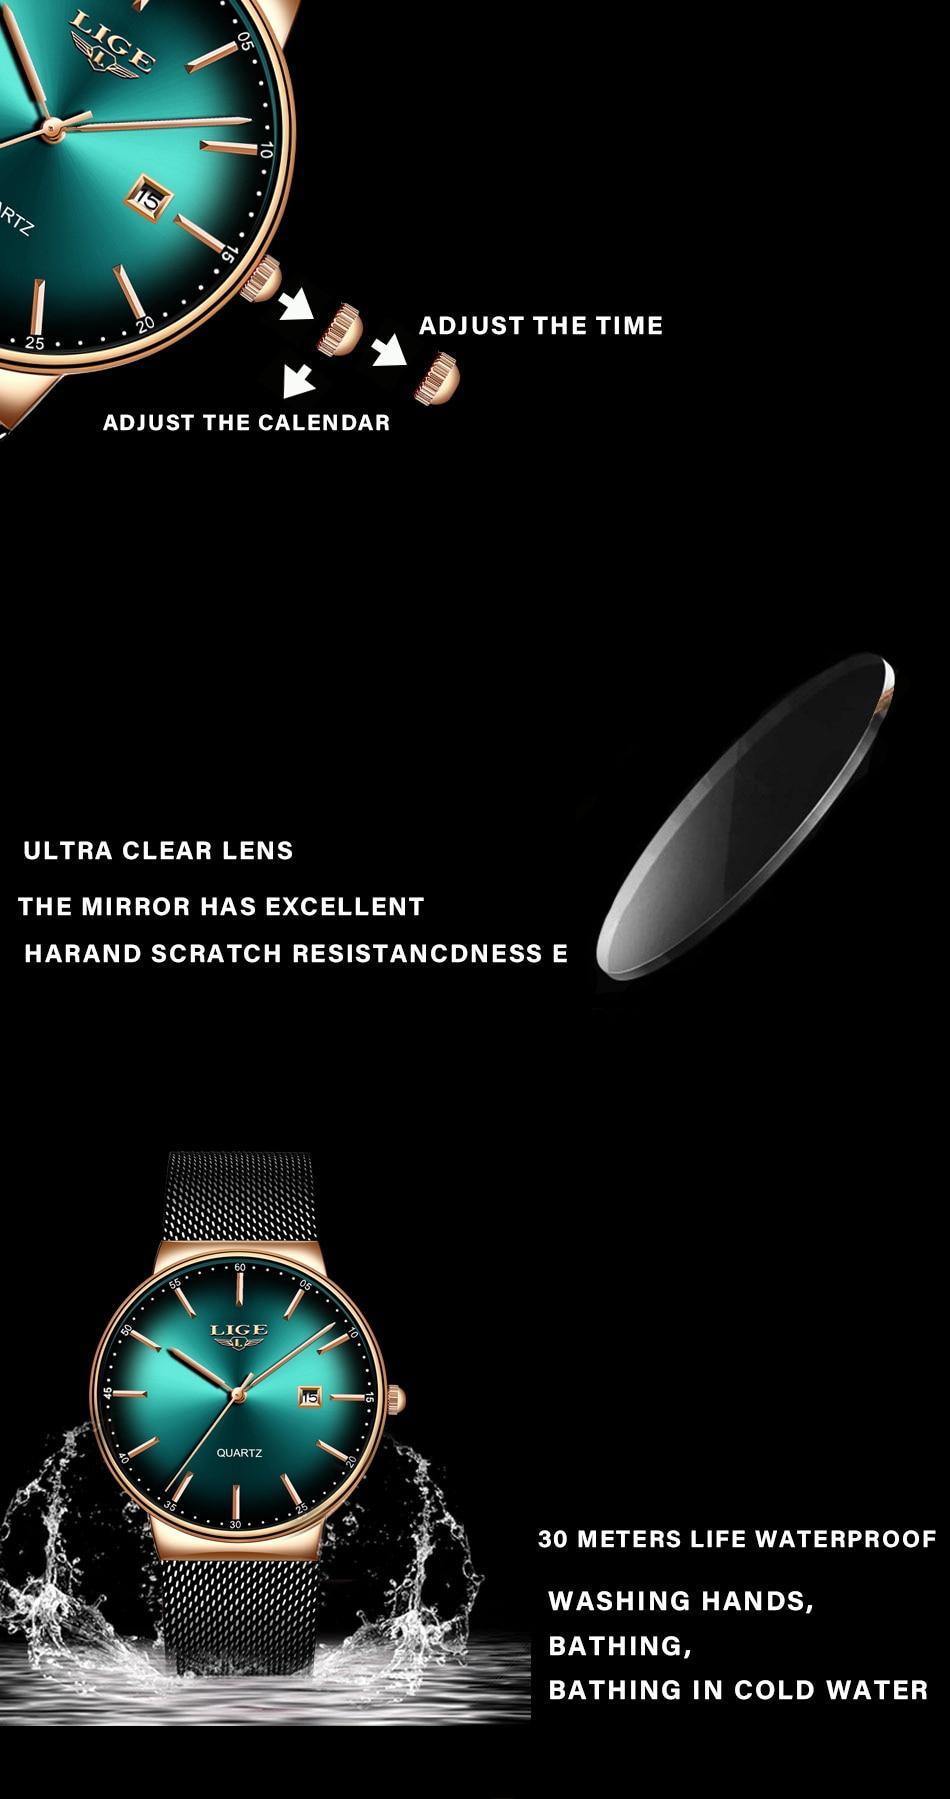 HTB16OpgTFzqK1RjSZFoq6zfcXXag LIGE Sports Date Mens Watches Top Brand Luxury Waterproof Fashion Cool Watch Men Ultra Thin Dial Quartz Watch Relogio Masculino